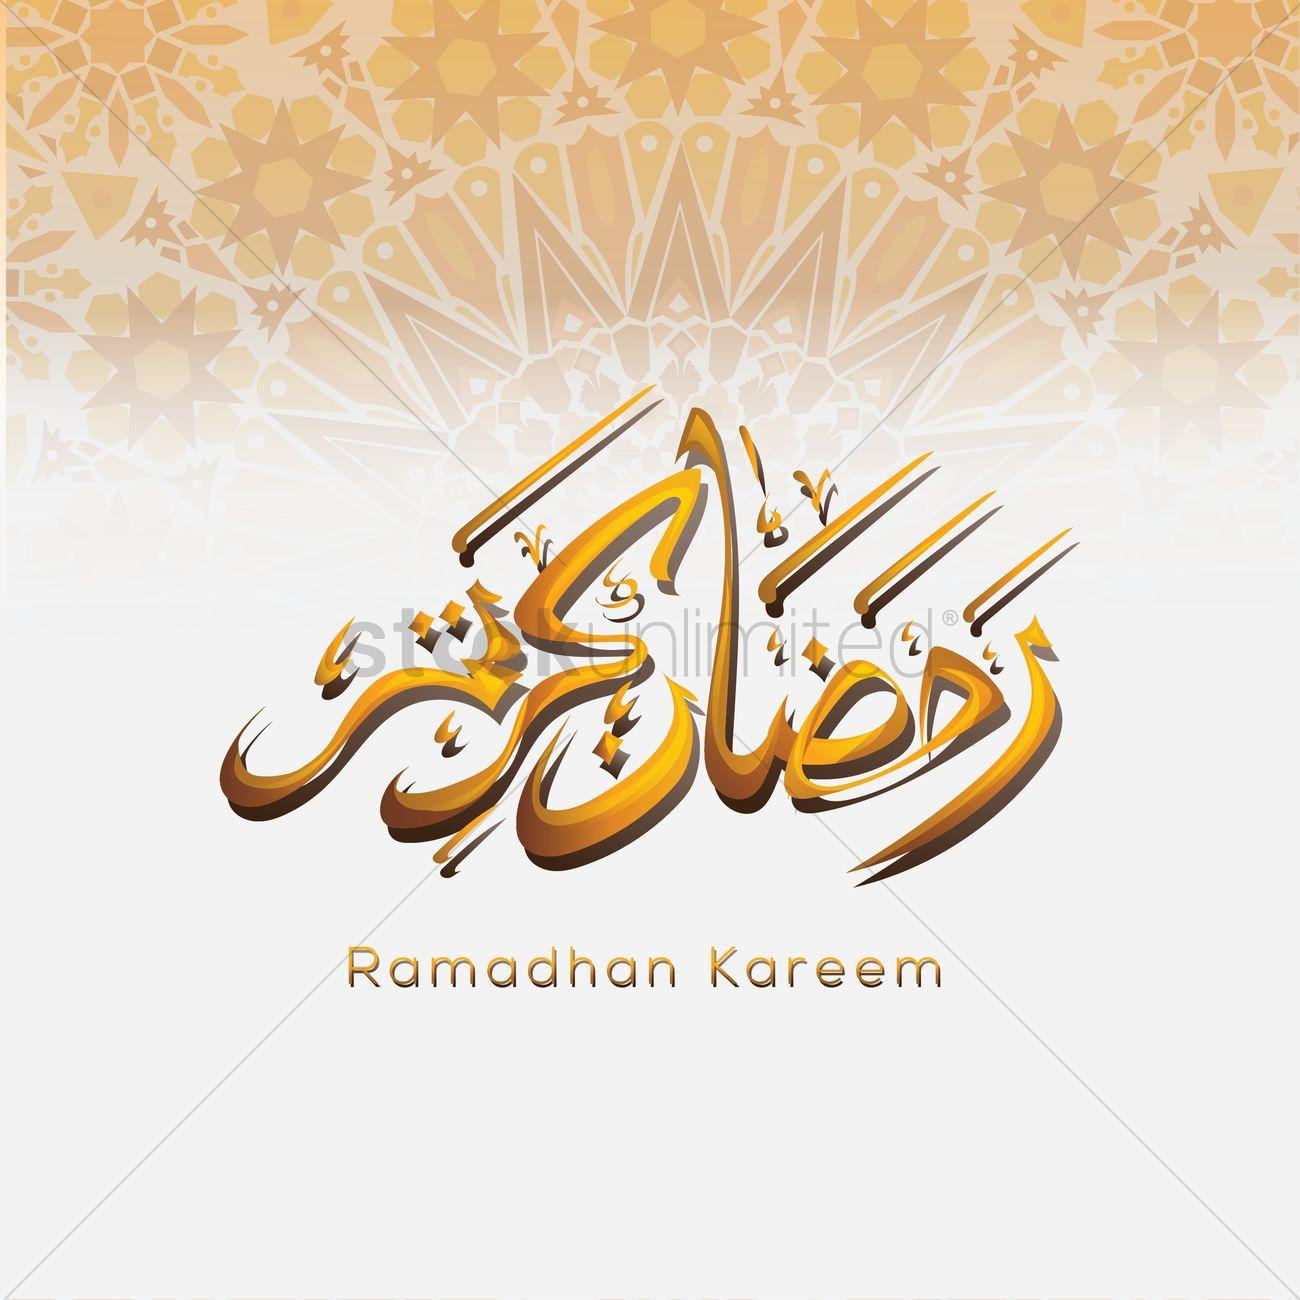 Ramadan Kareem Greeting In Jawi Vector Image 1826912 Stockunlimited